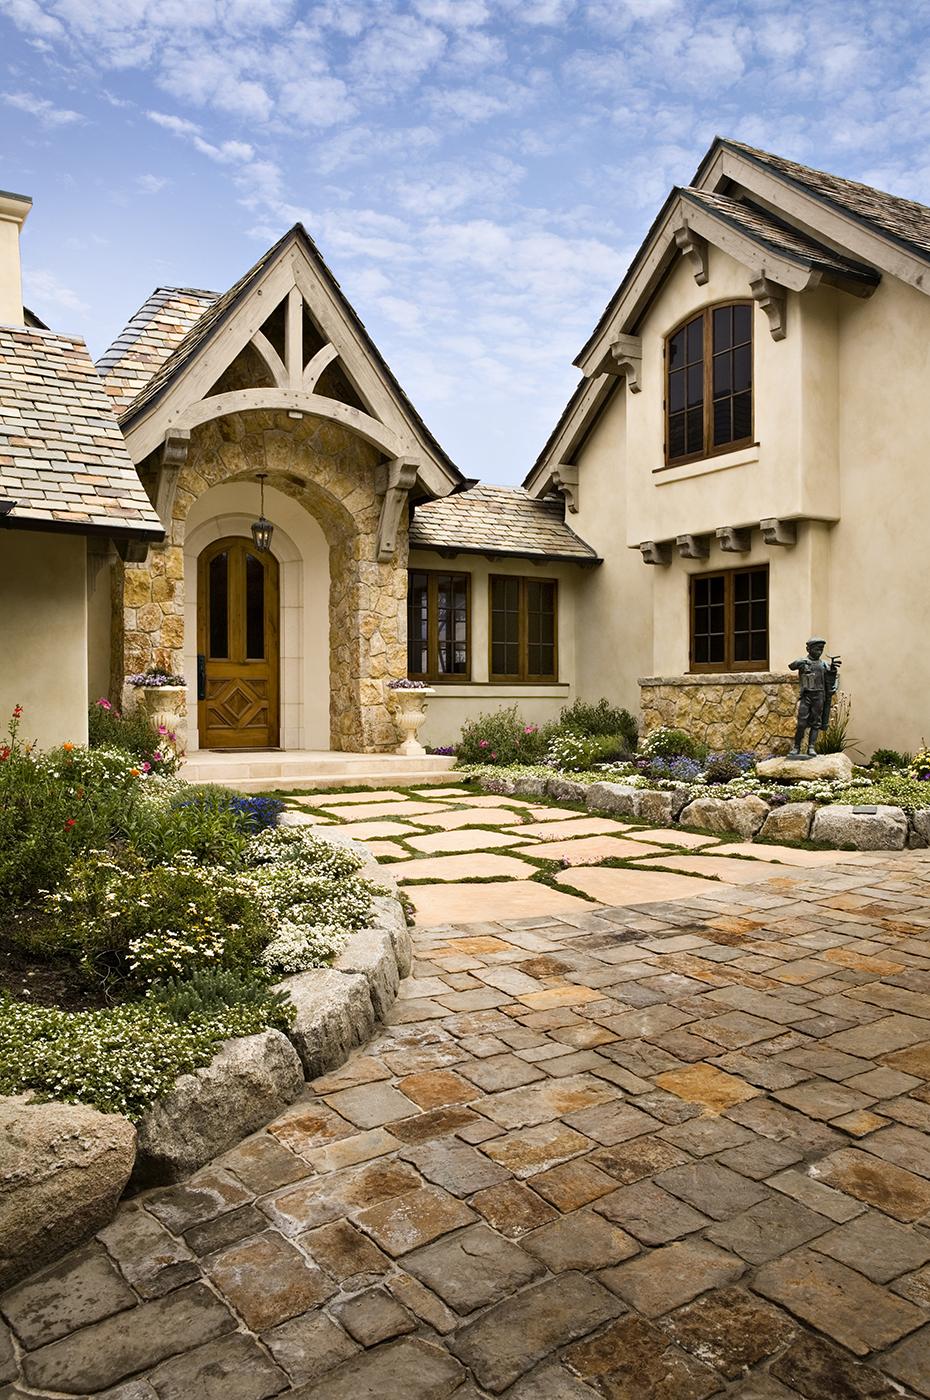 5-Smith-Entry-dune landscaping-mahogany doors and windows.jpg